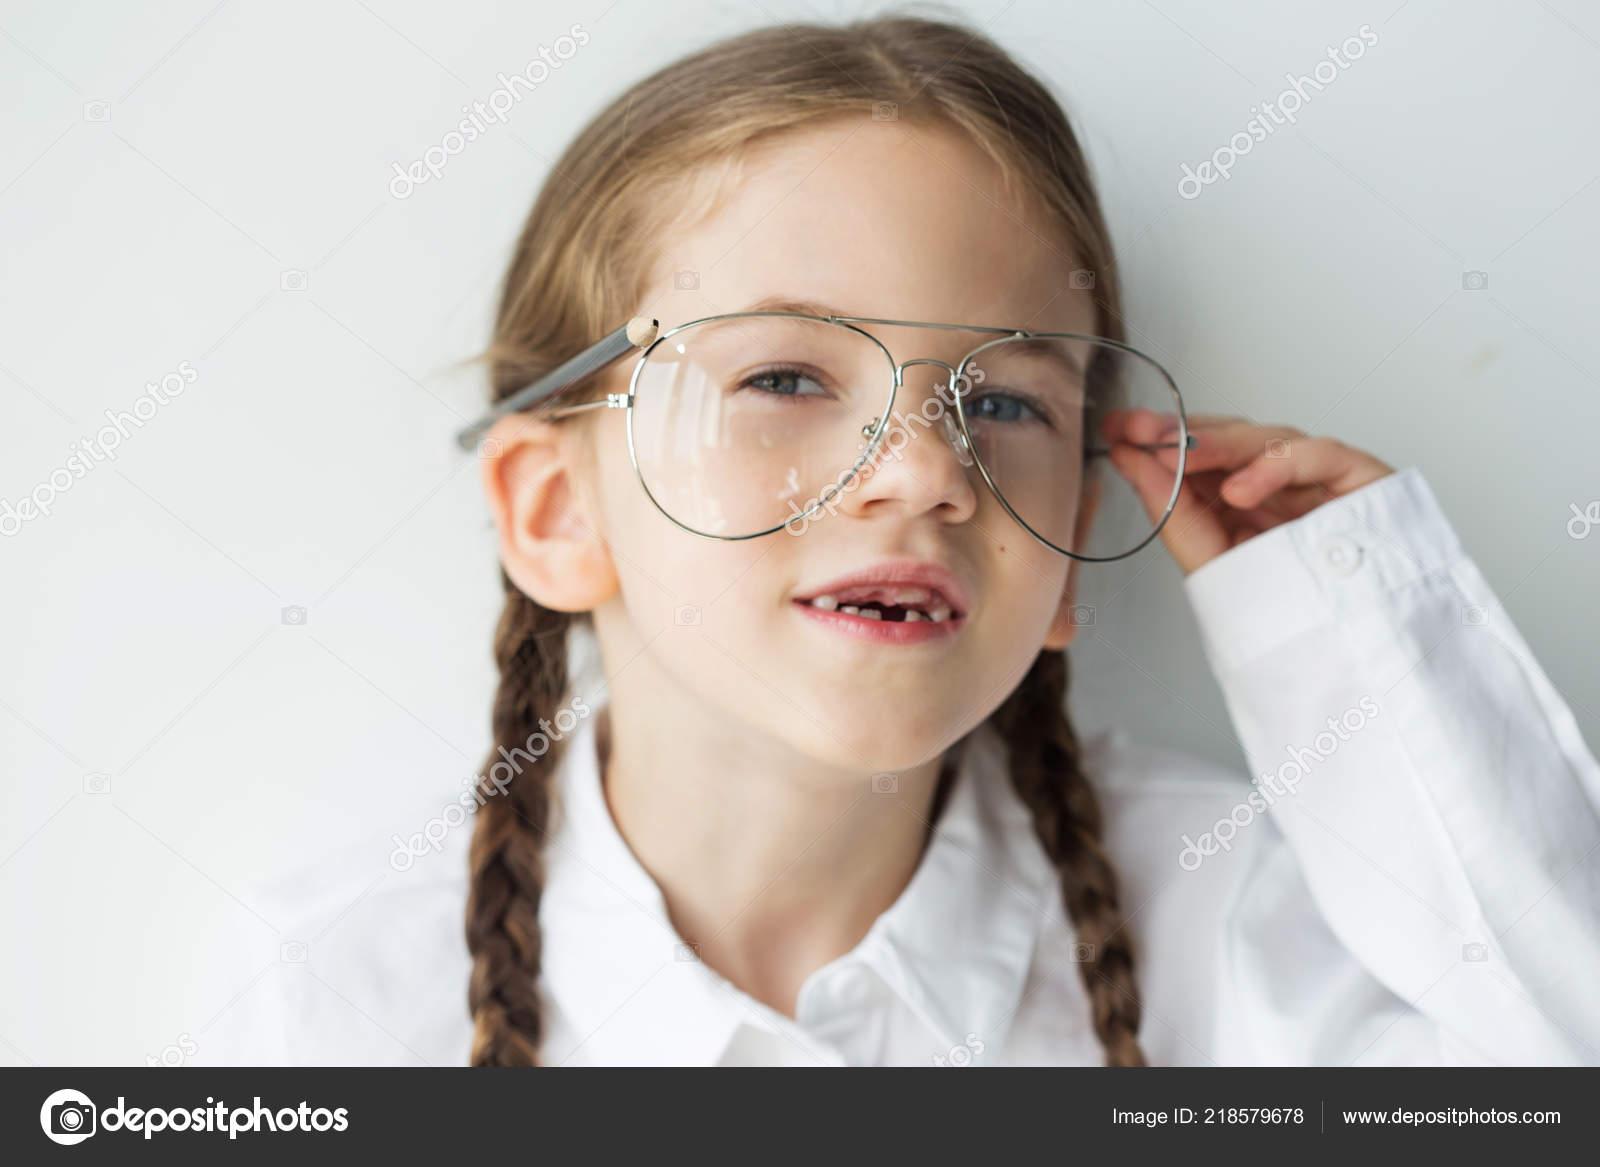 90f6ae8f4663 Little Happy Girl Wearing Glasses Education School Preschool Child Smart —  Stock Photo